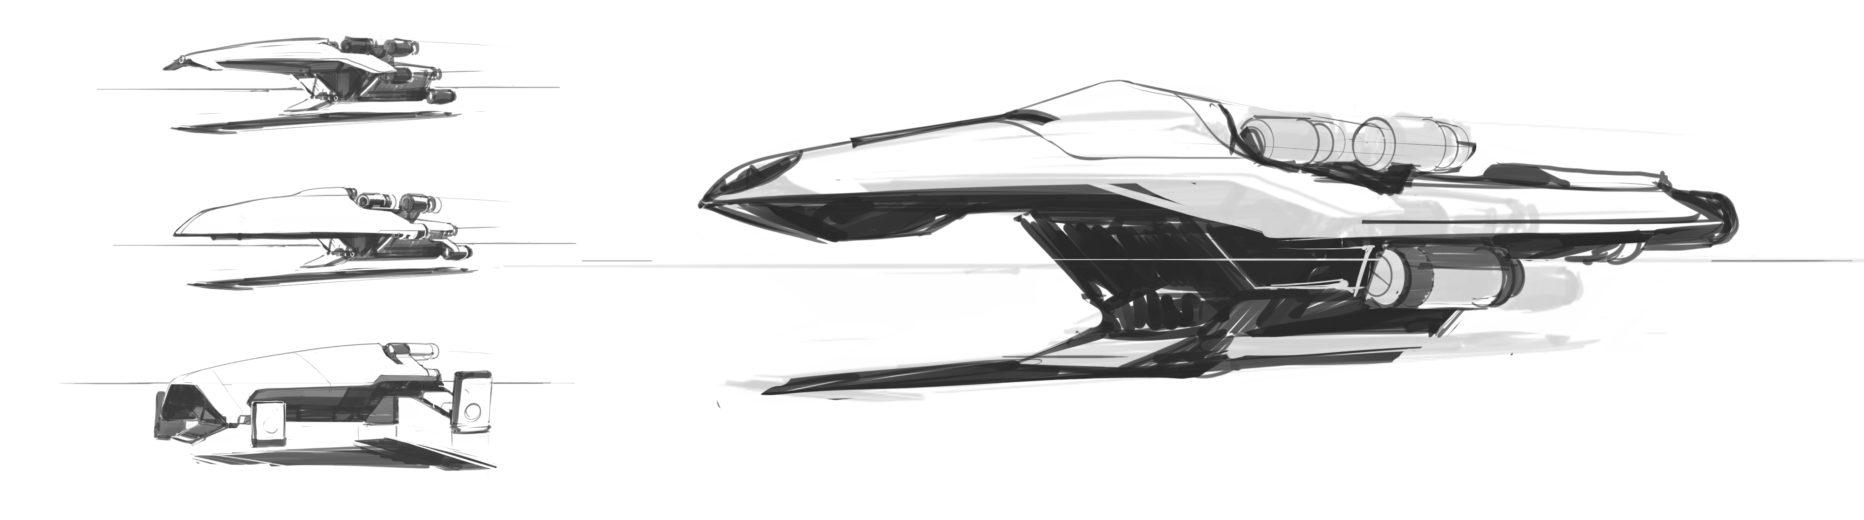 SC-Hercules-Concept-Art-9.jpg